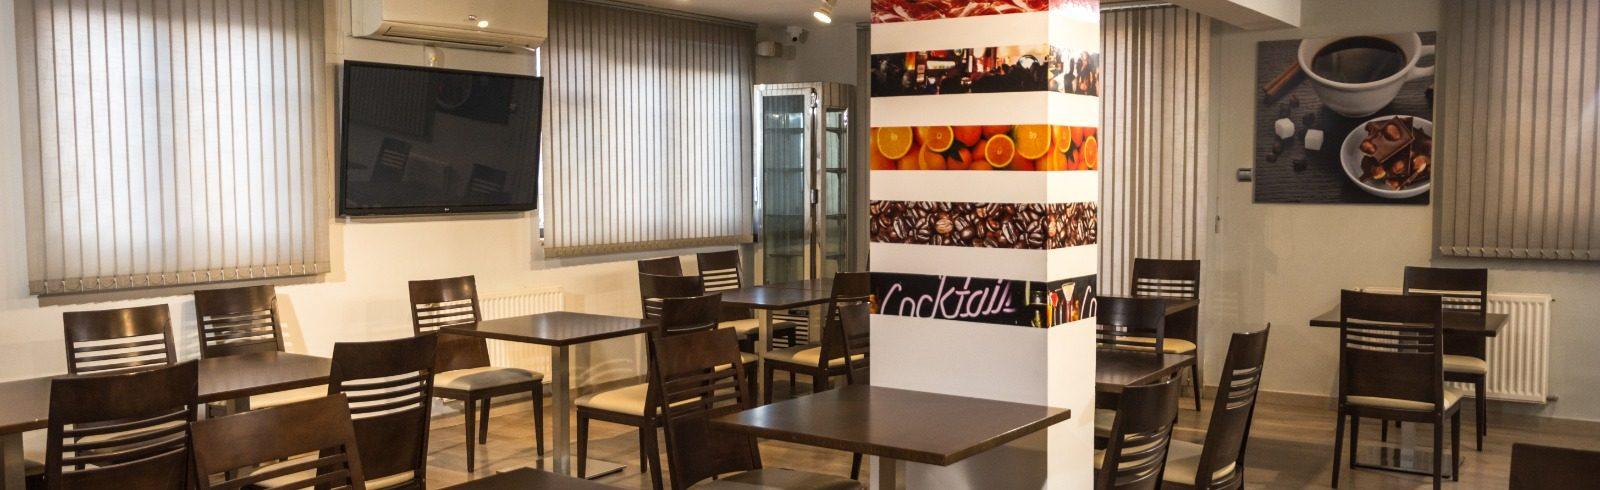 oasis zamora restaurante _hostal (30)